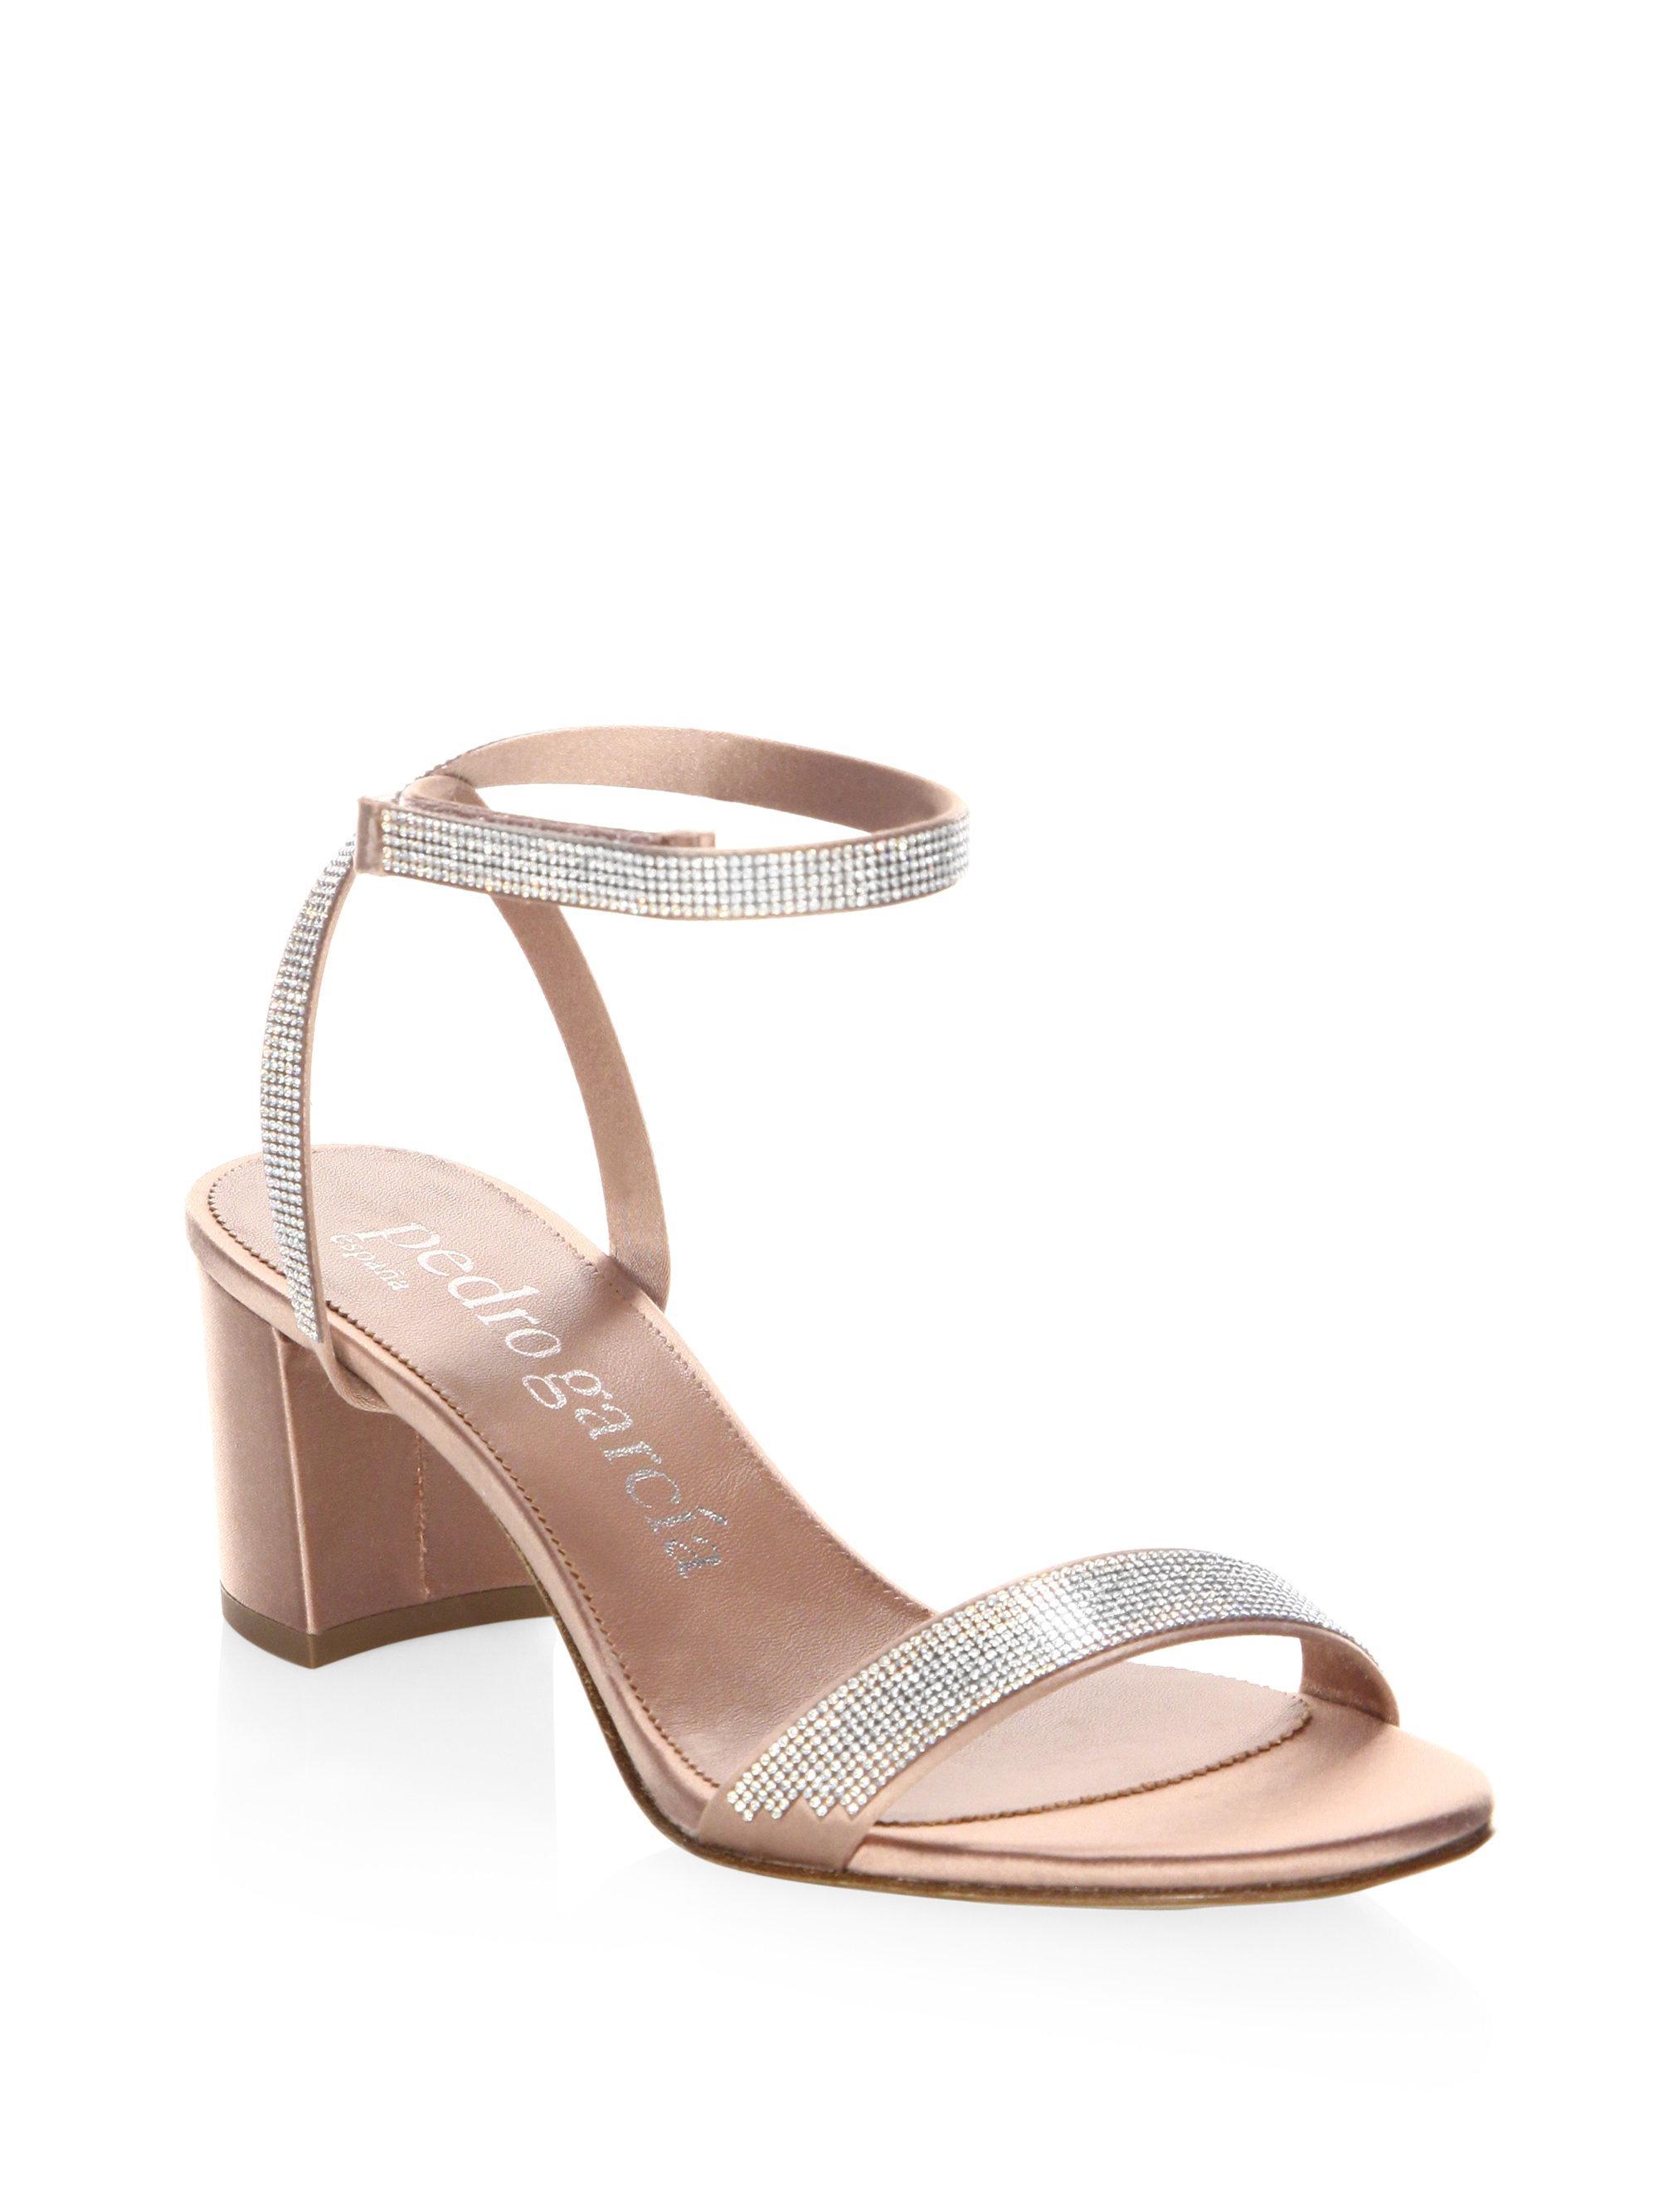 Pedro Garcia Xela Swarovski Crystal Embellished Block-Heel Sandals